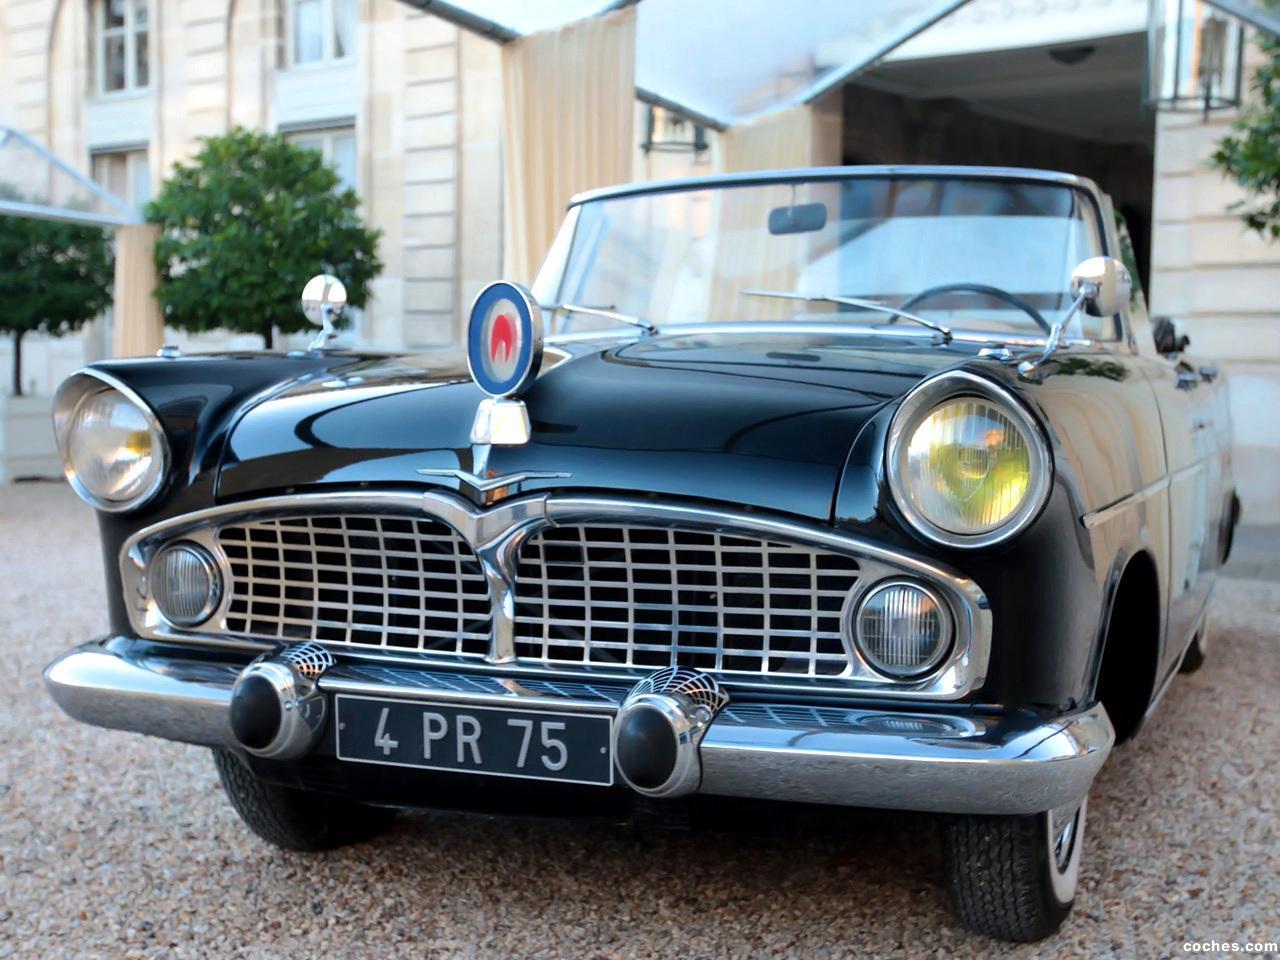 Foto 0 de Simca Presidence Cabriolet 1957